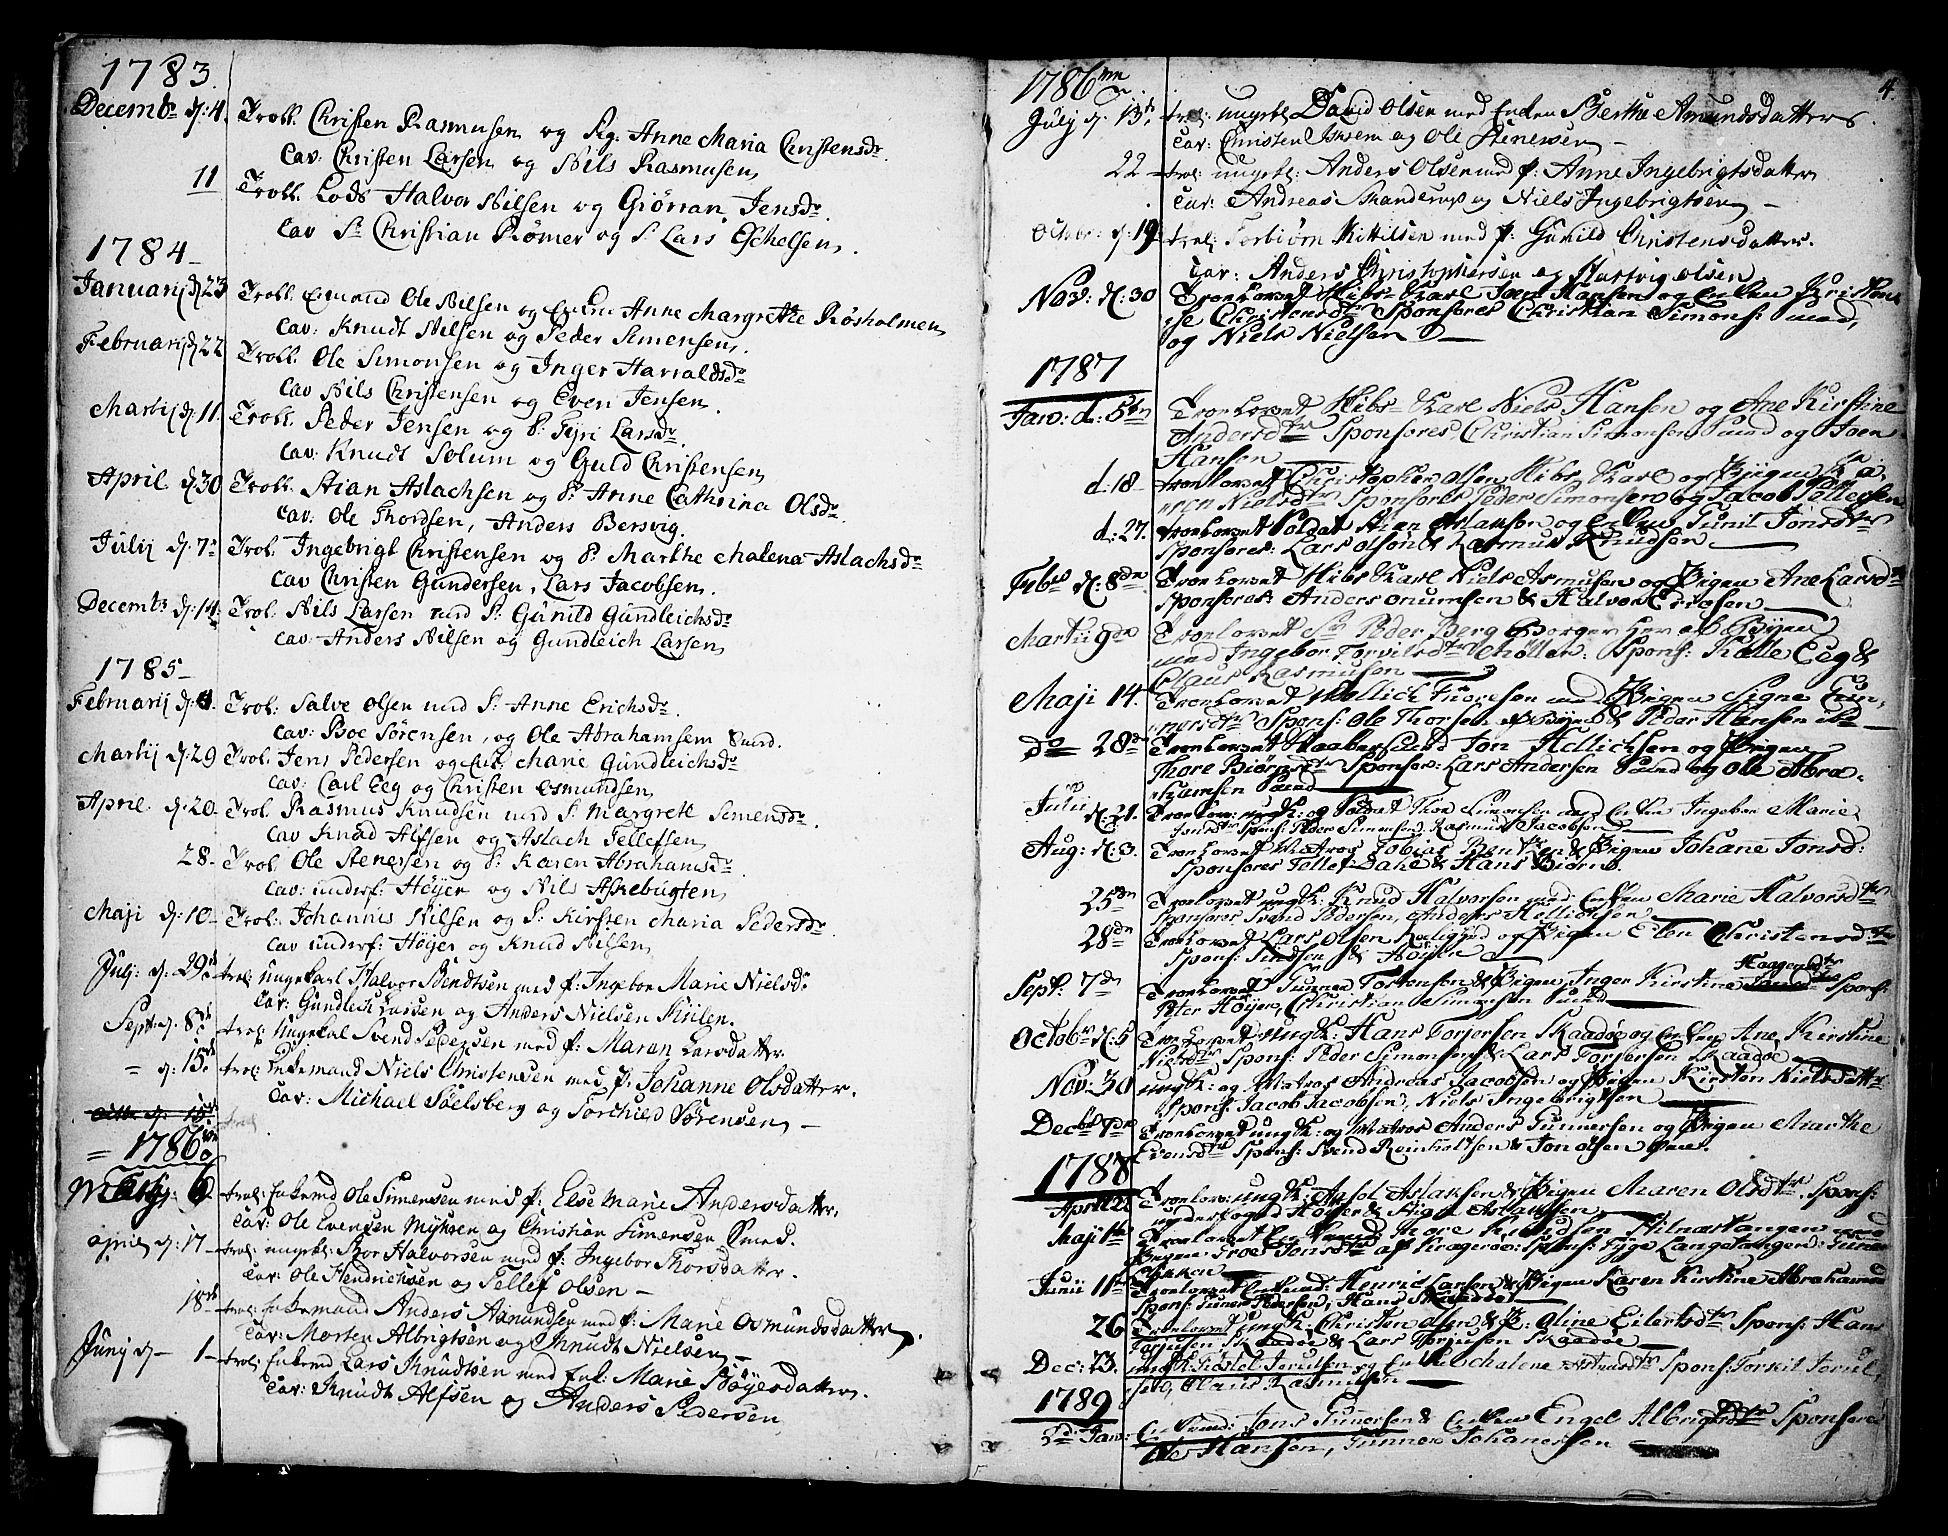 SAKO, Kragerø kirkebøker, F/Fa/L0002: Ministerialbok nr. 2, 1767-1802, s. 4